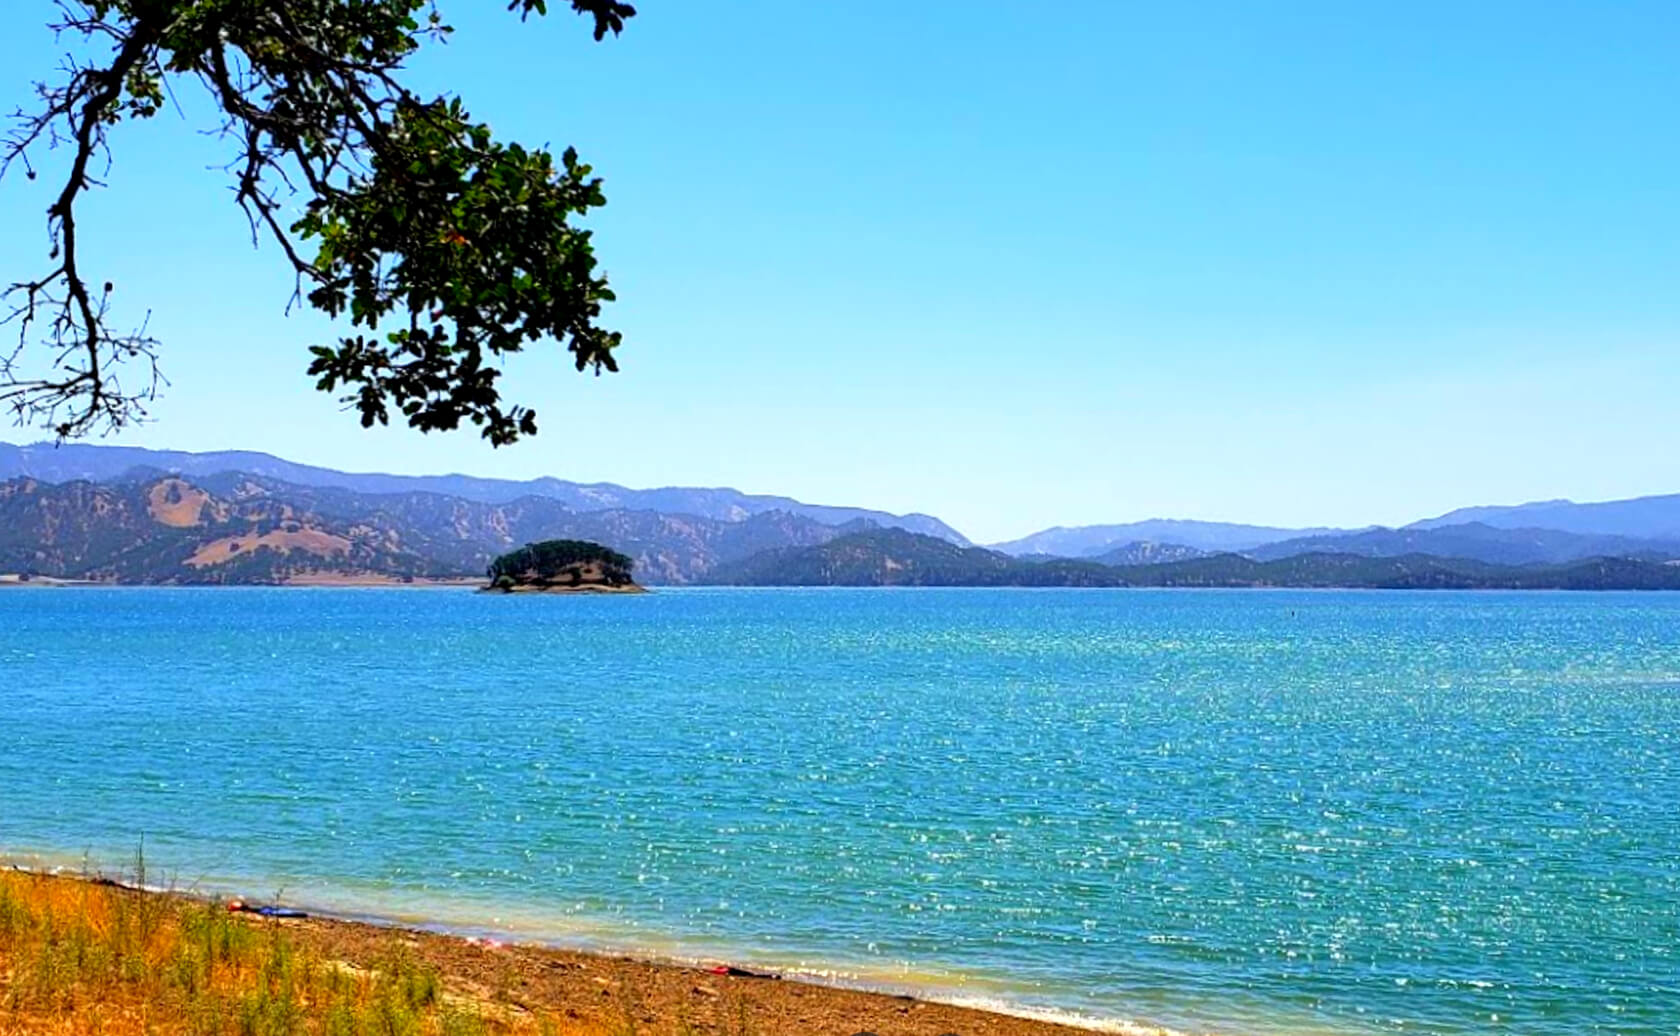 Lake-Berryessa-Fishing-Guide-Report-Napa-CA-03